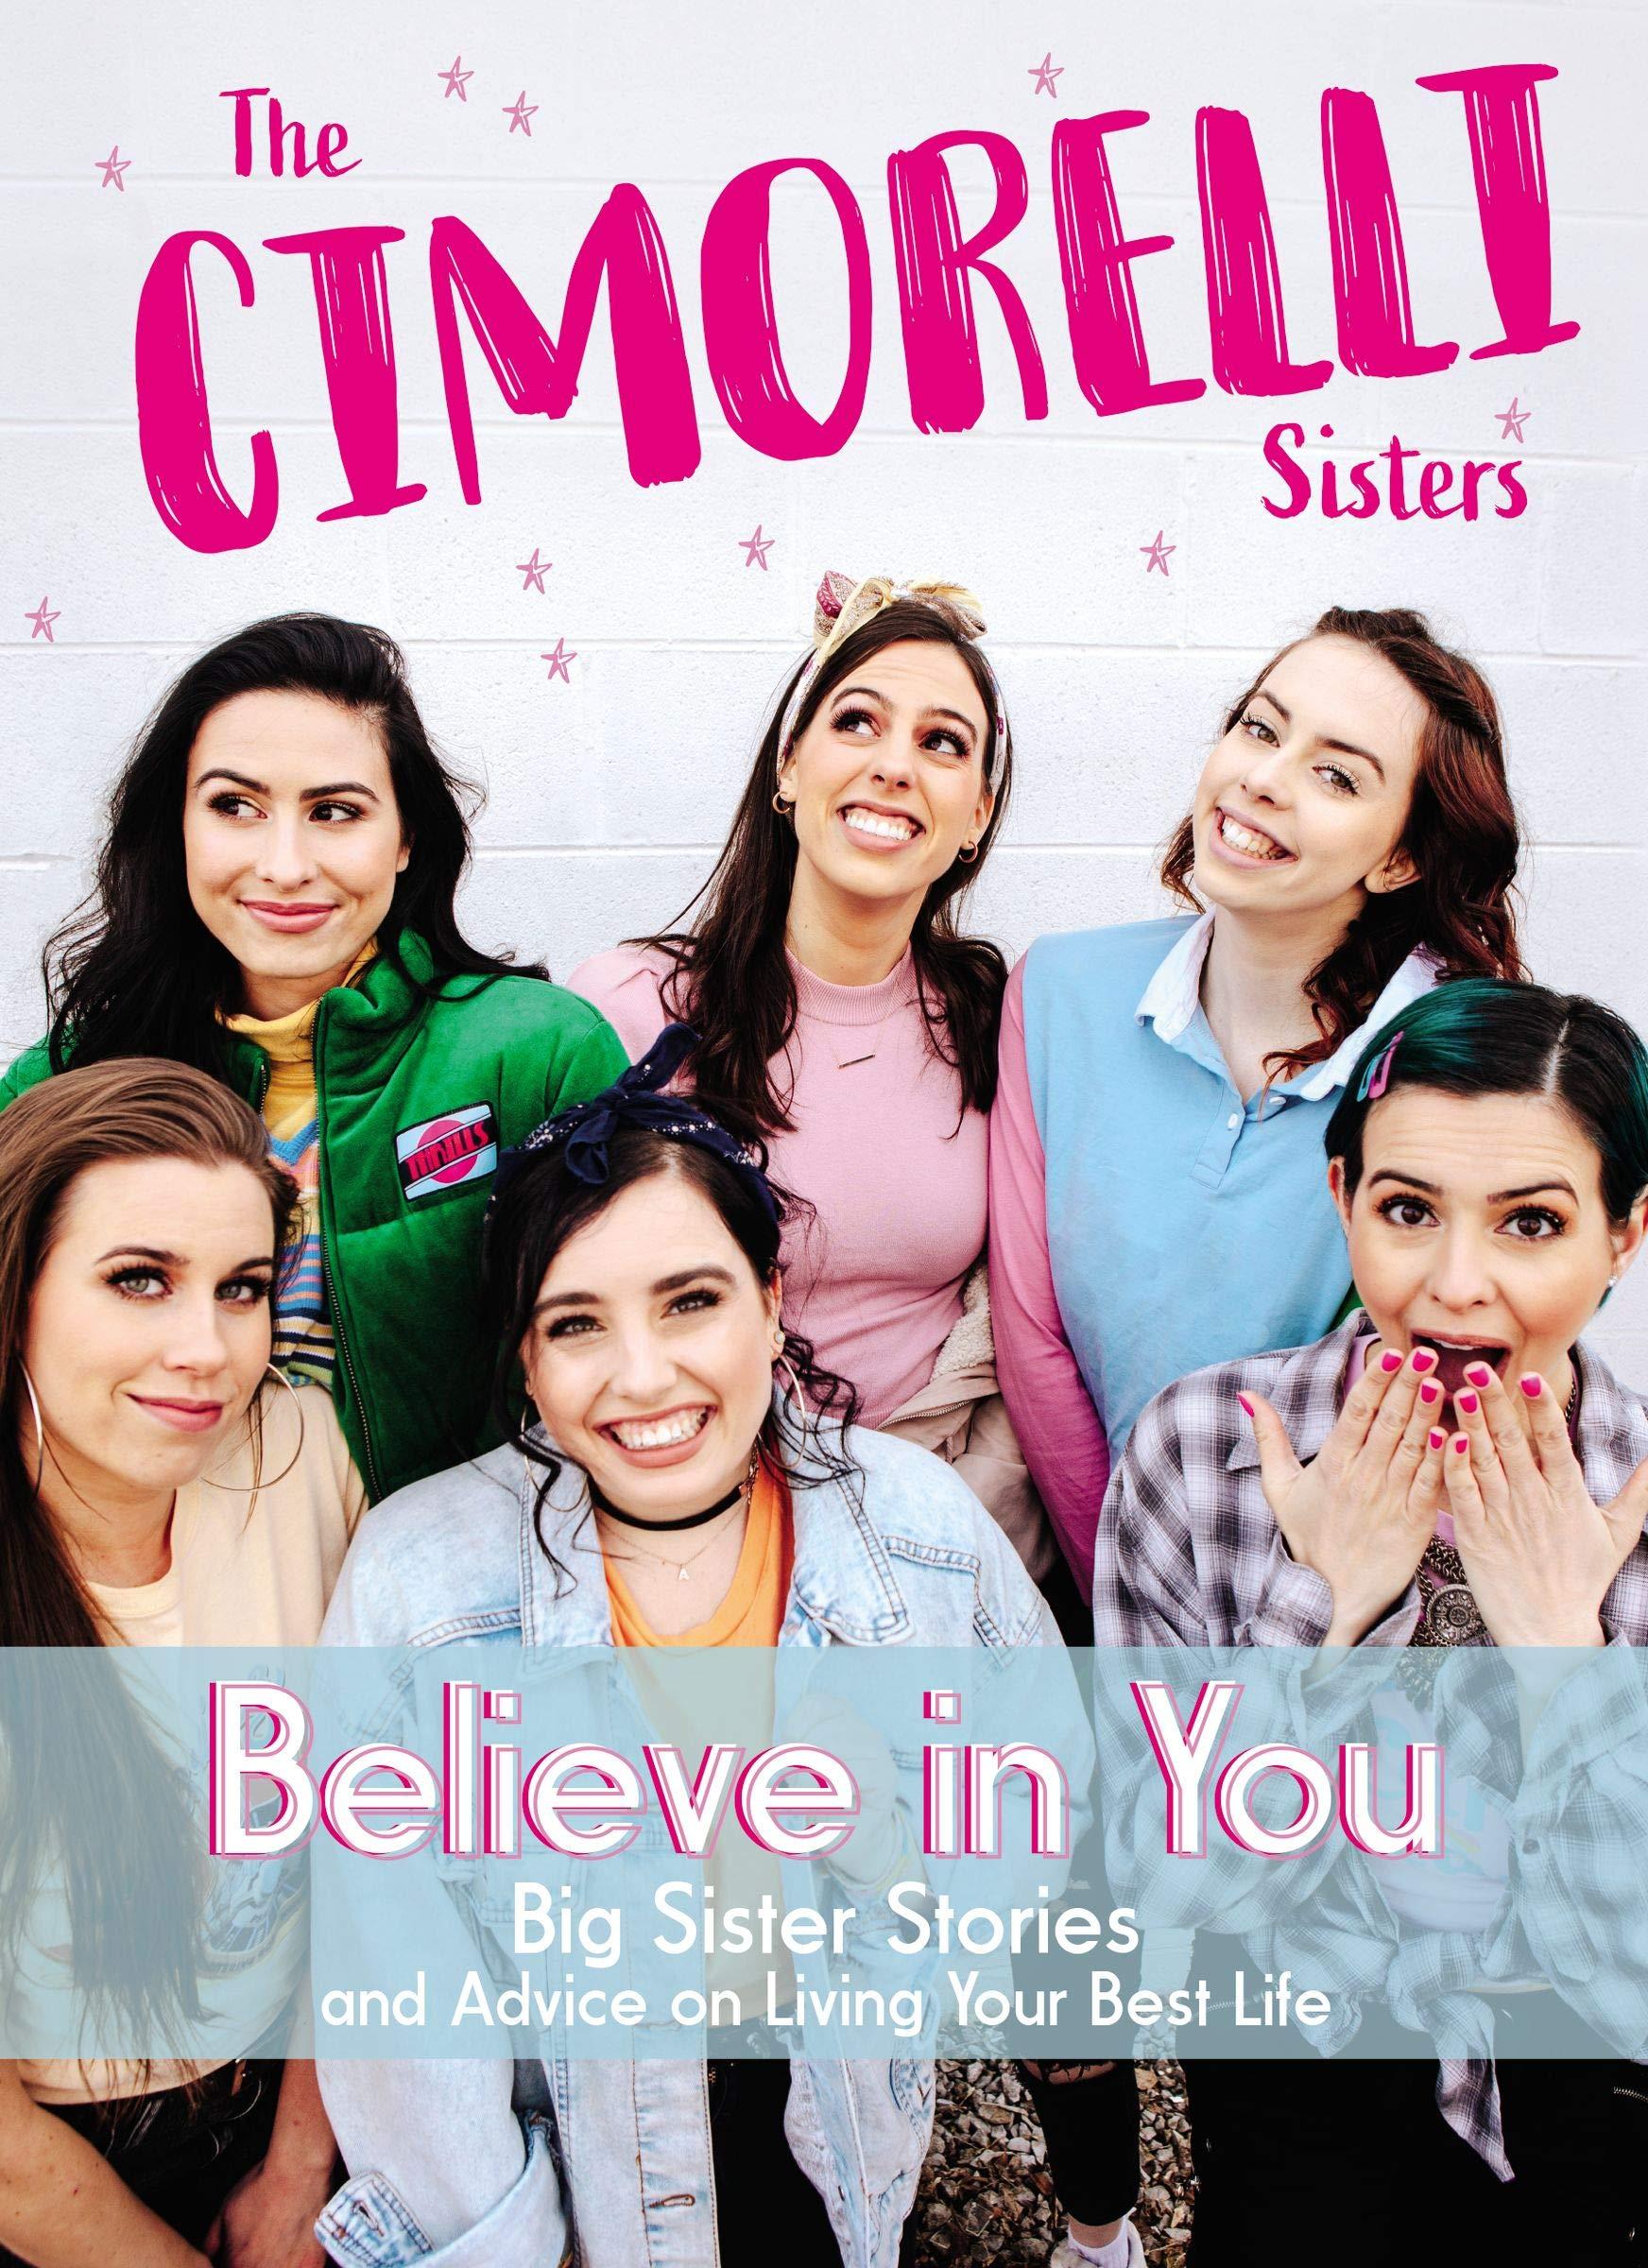 30 Best Musik images | Cimorelli sisters, Cimorelli, Lauren